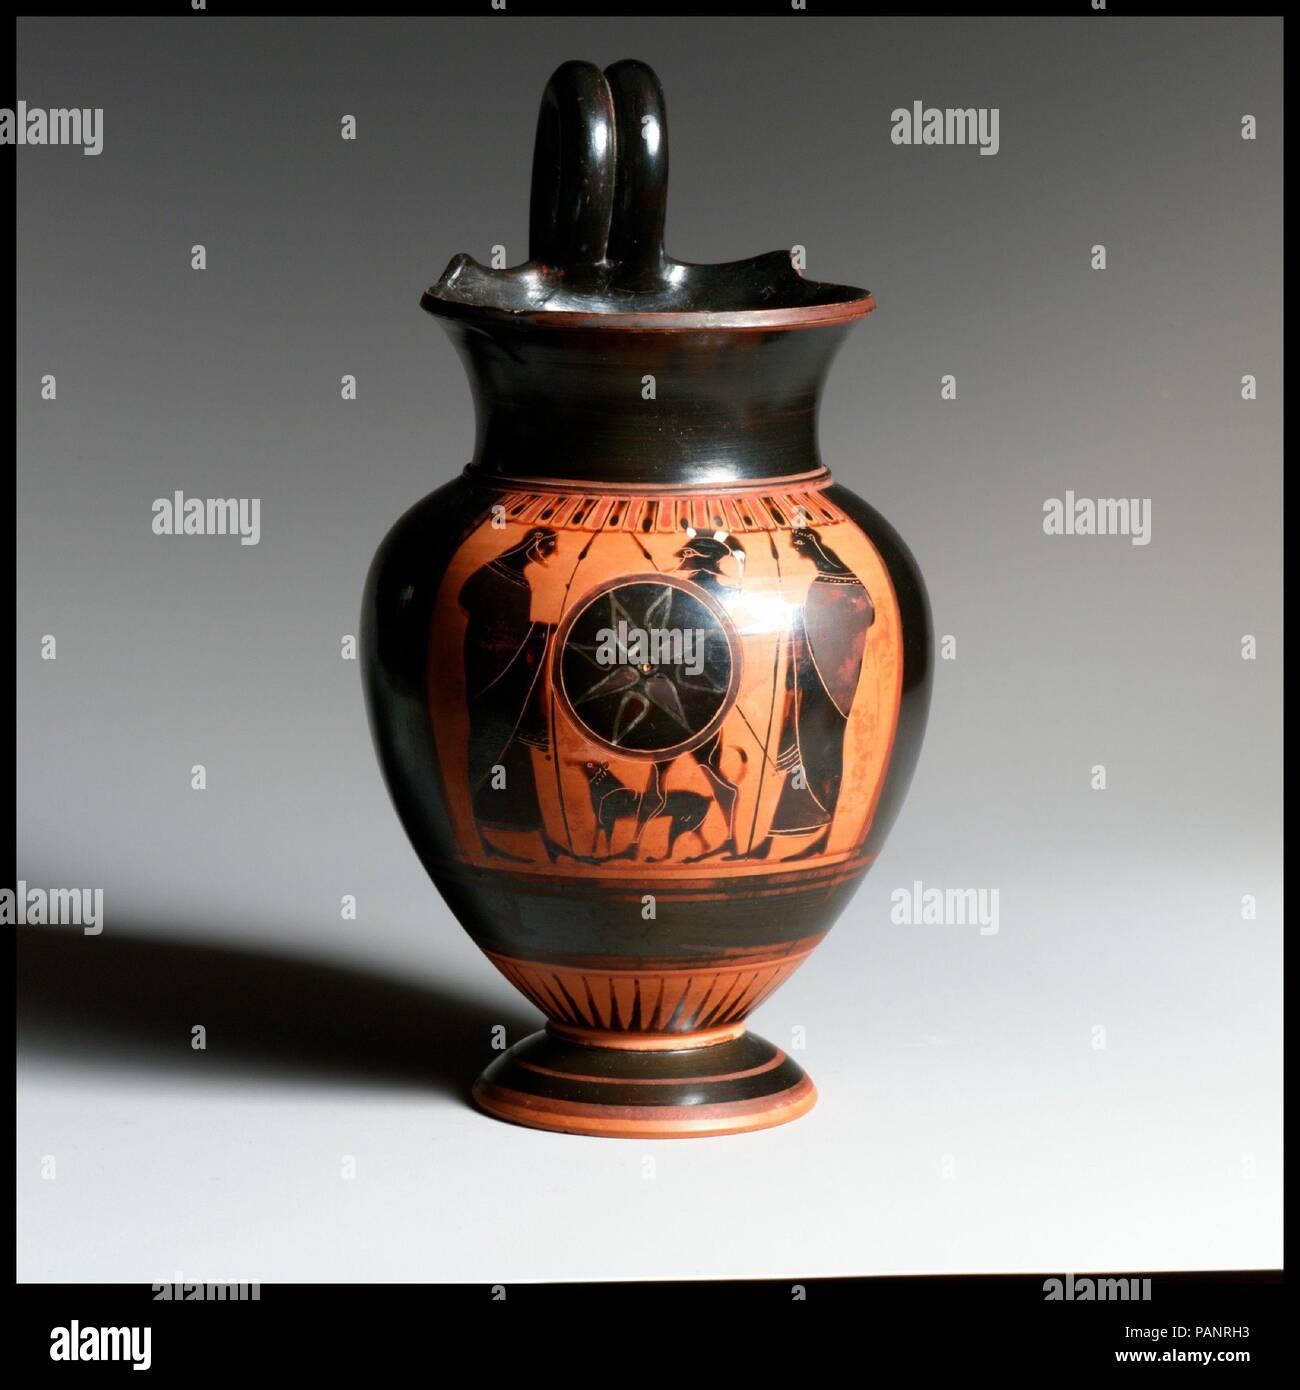 Terracotta oinochoe (jug). Culture: Greek, Attic. Dimensions: 7 1/2in. (19.1cm). Date: ca. 550 B.C..  Warrior departing. Museum: Metropolitan Museum of Art, New York, USA. Stock Photo